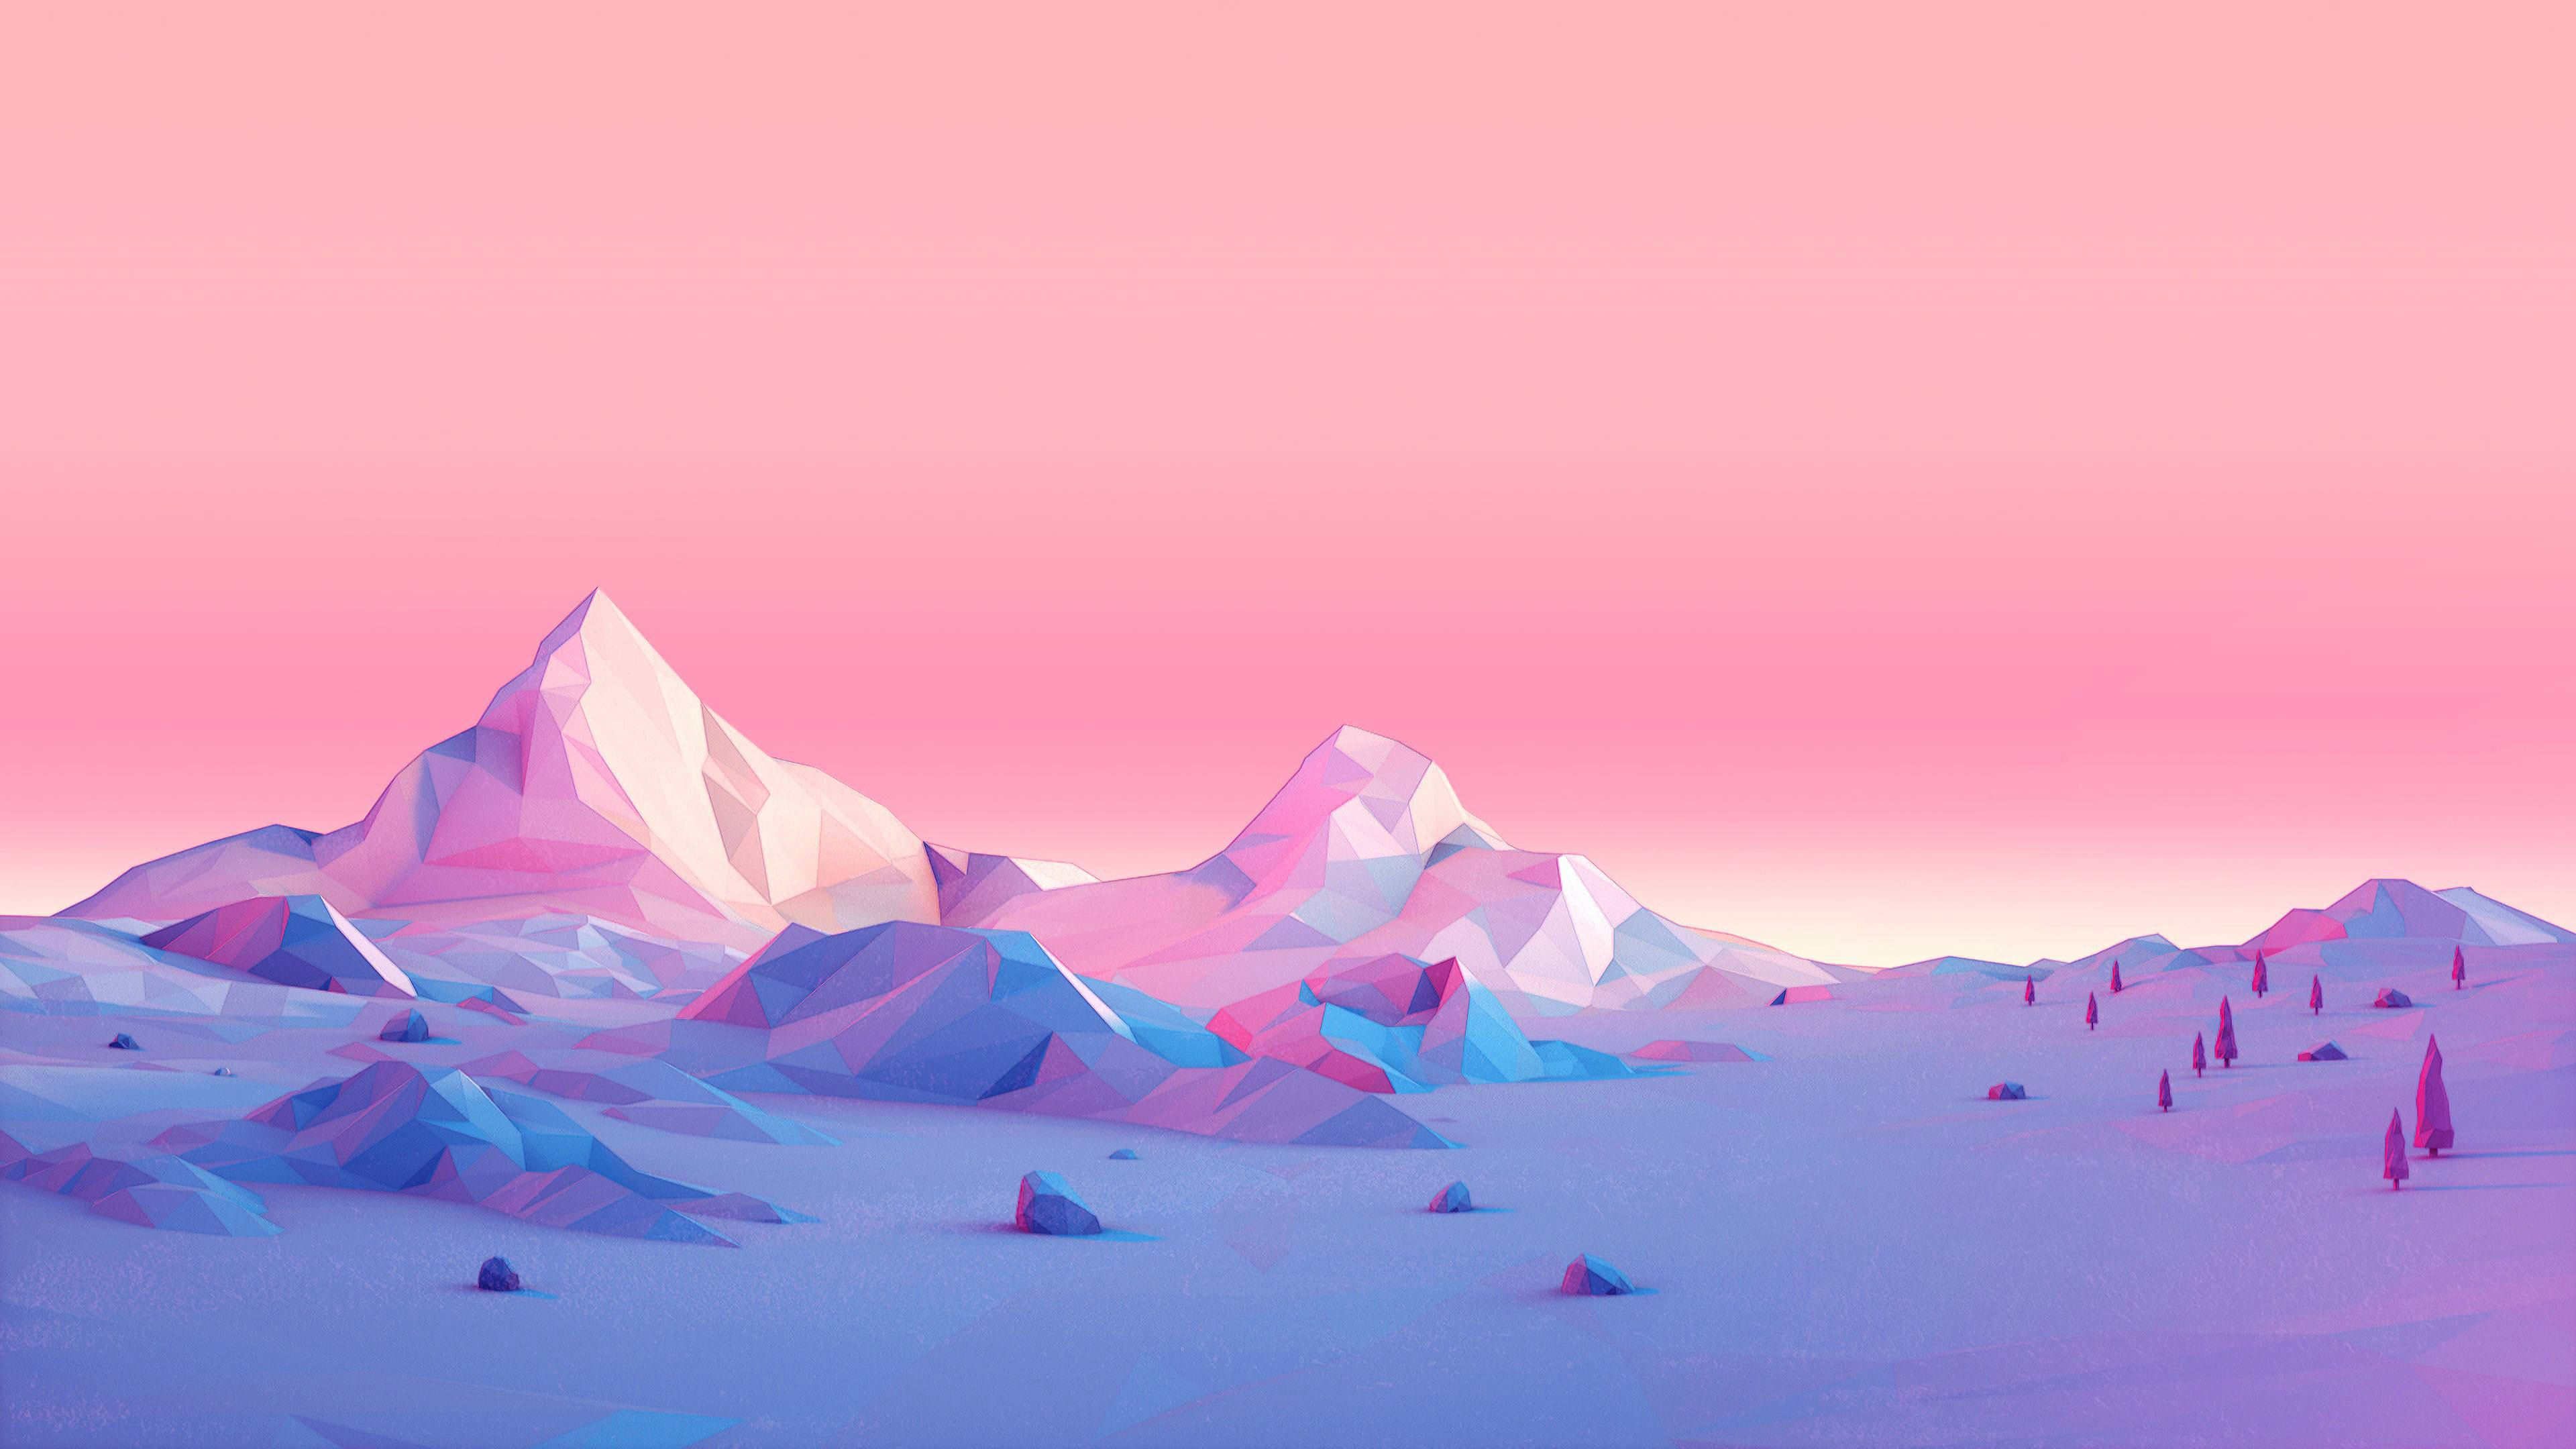 Minimalist Pink Wallpapers Top Free Minimalist Pink Backgrounds Wallpaperaccess